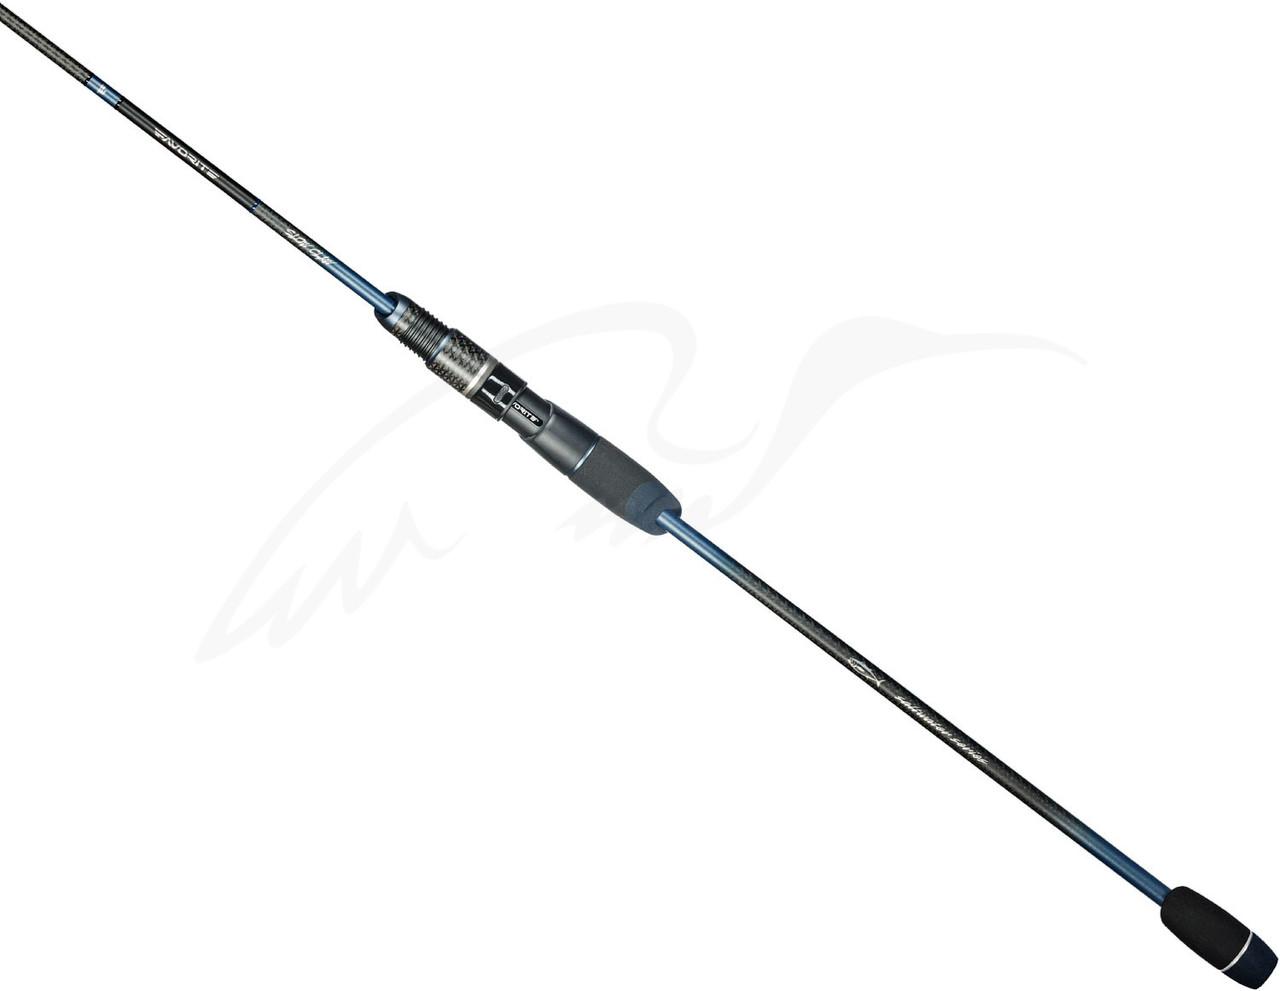 Спінінг Favorite SW Slow Claw SLC-661ML 2.02 m Jig 30-100g Power Class 1